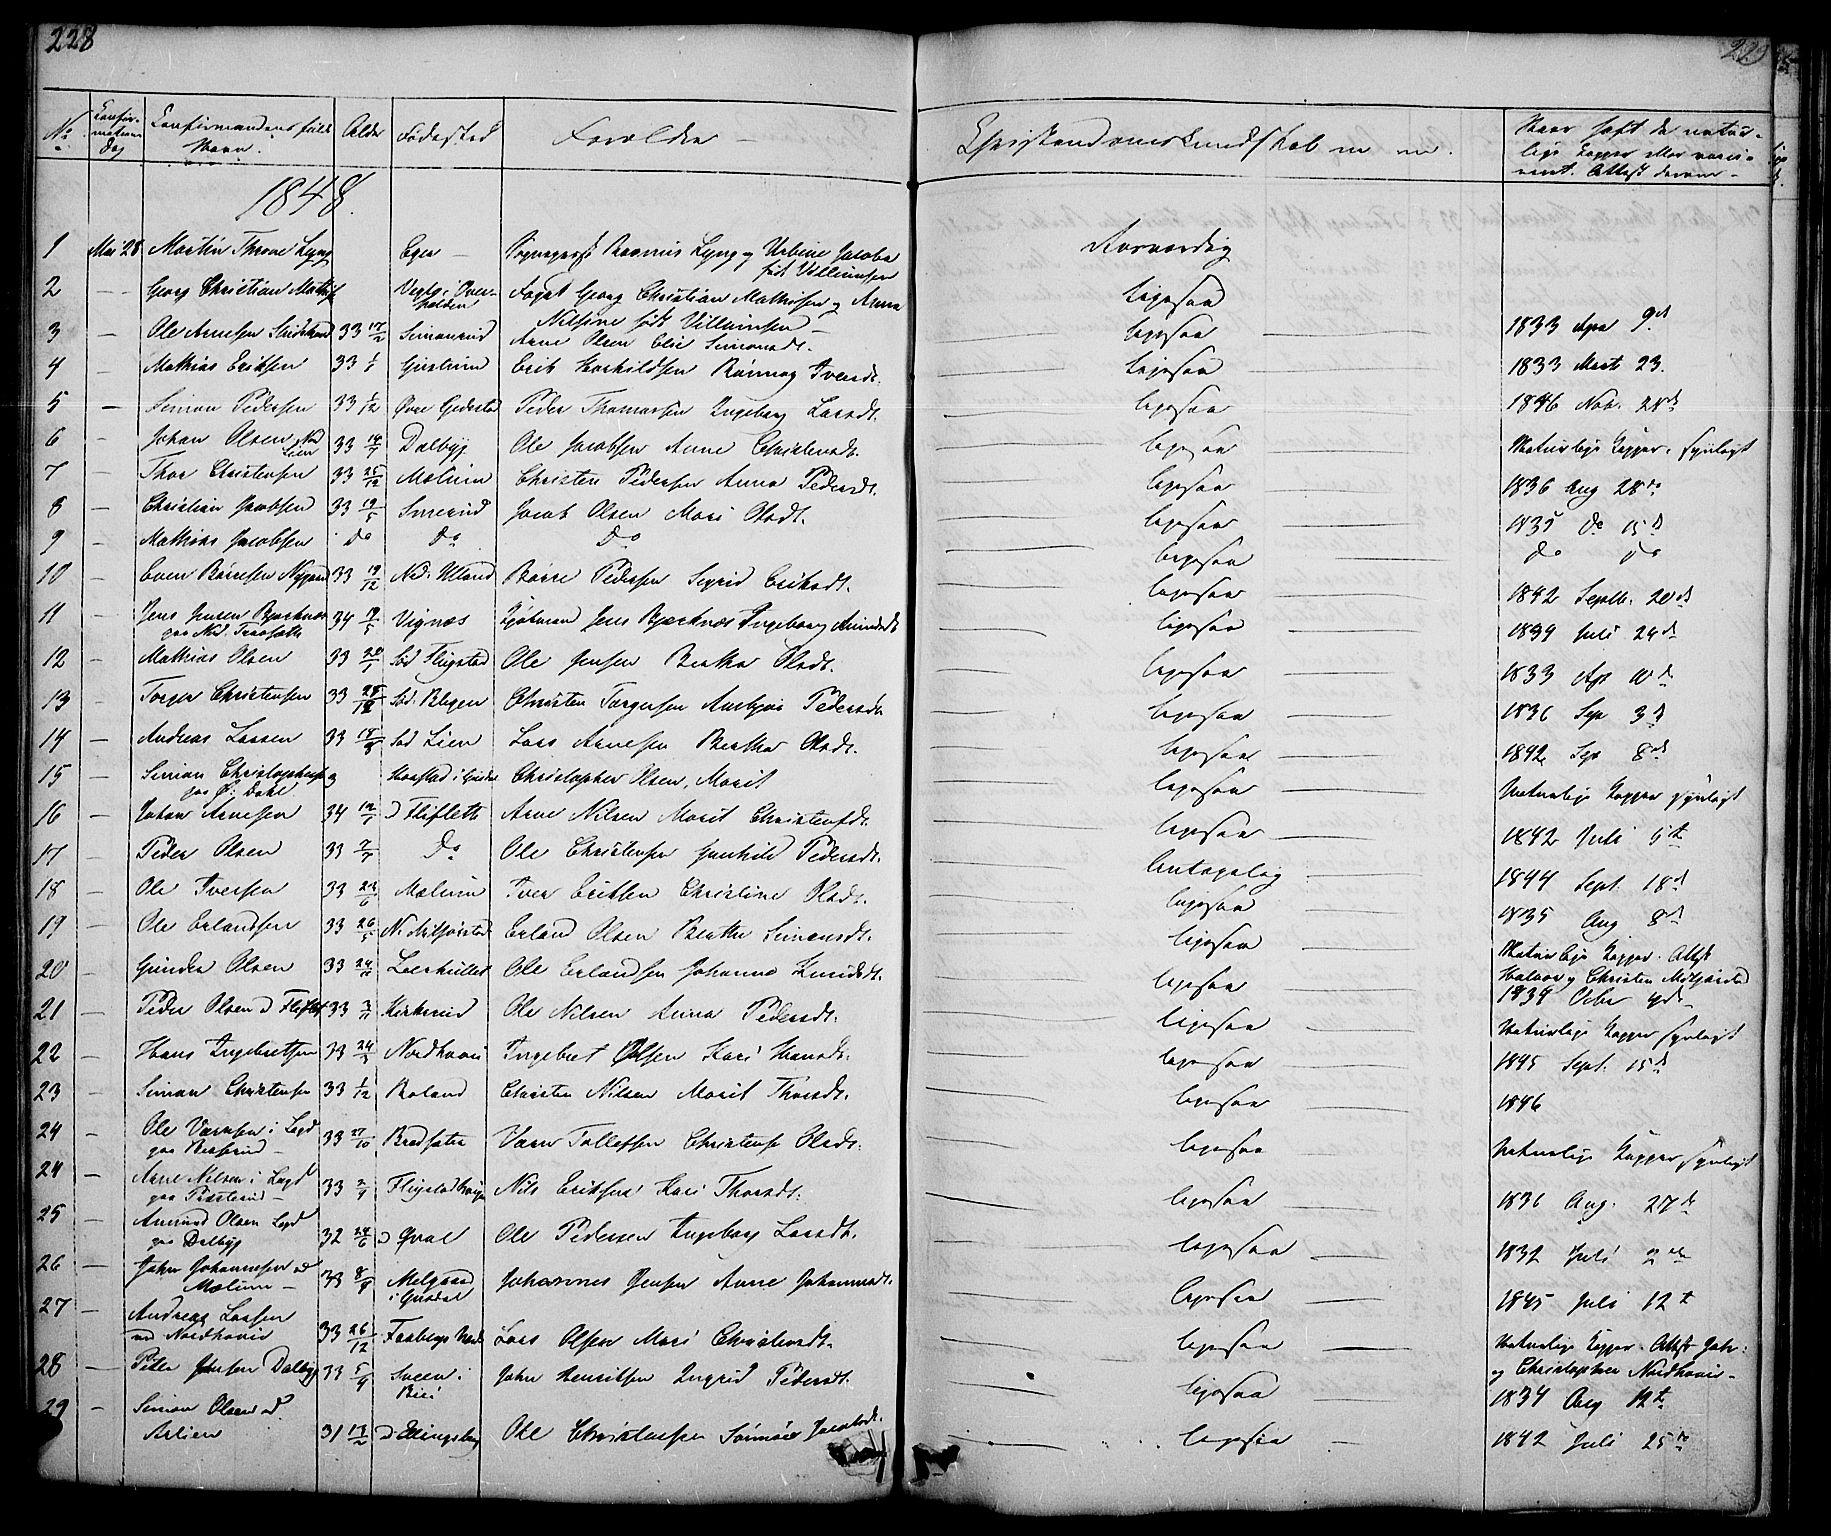 SAH, Fåberg prestekontor, Klokkerbok nr. 5, 1837-1864, s. 228-229